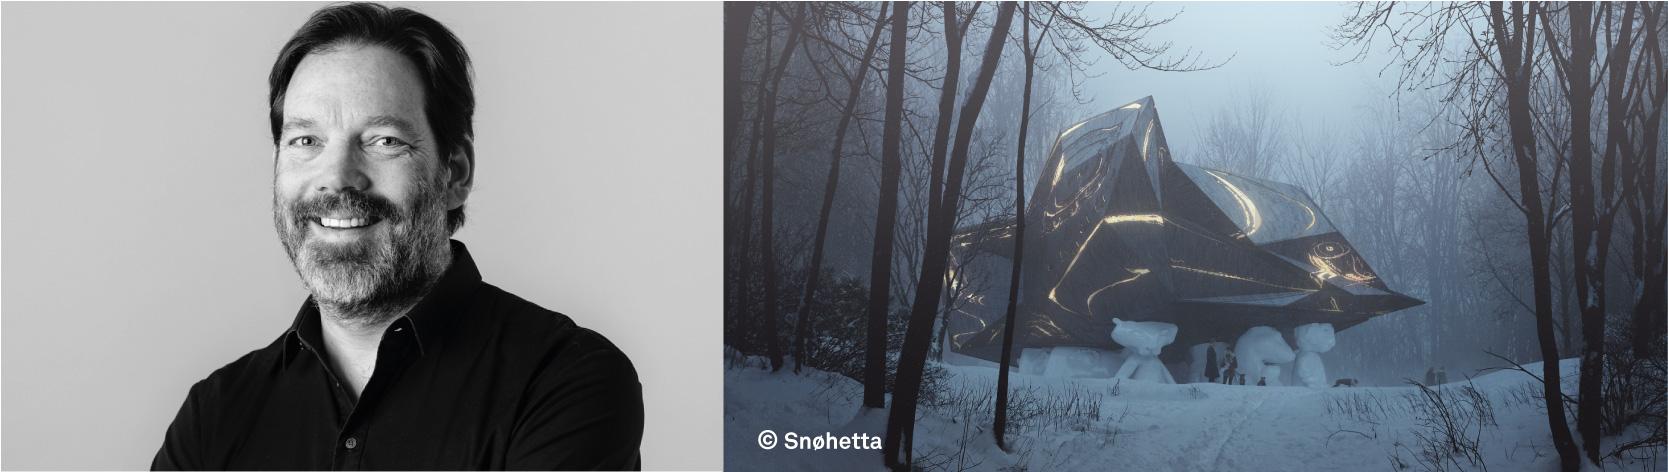 Patrick Lüth - Snohetta - Project Portrait